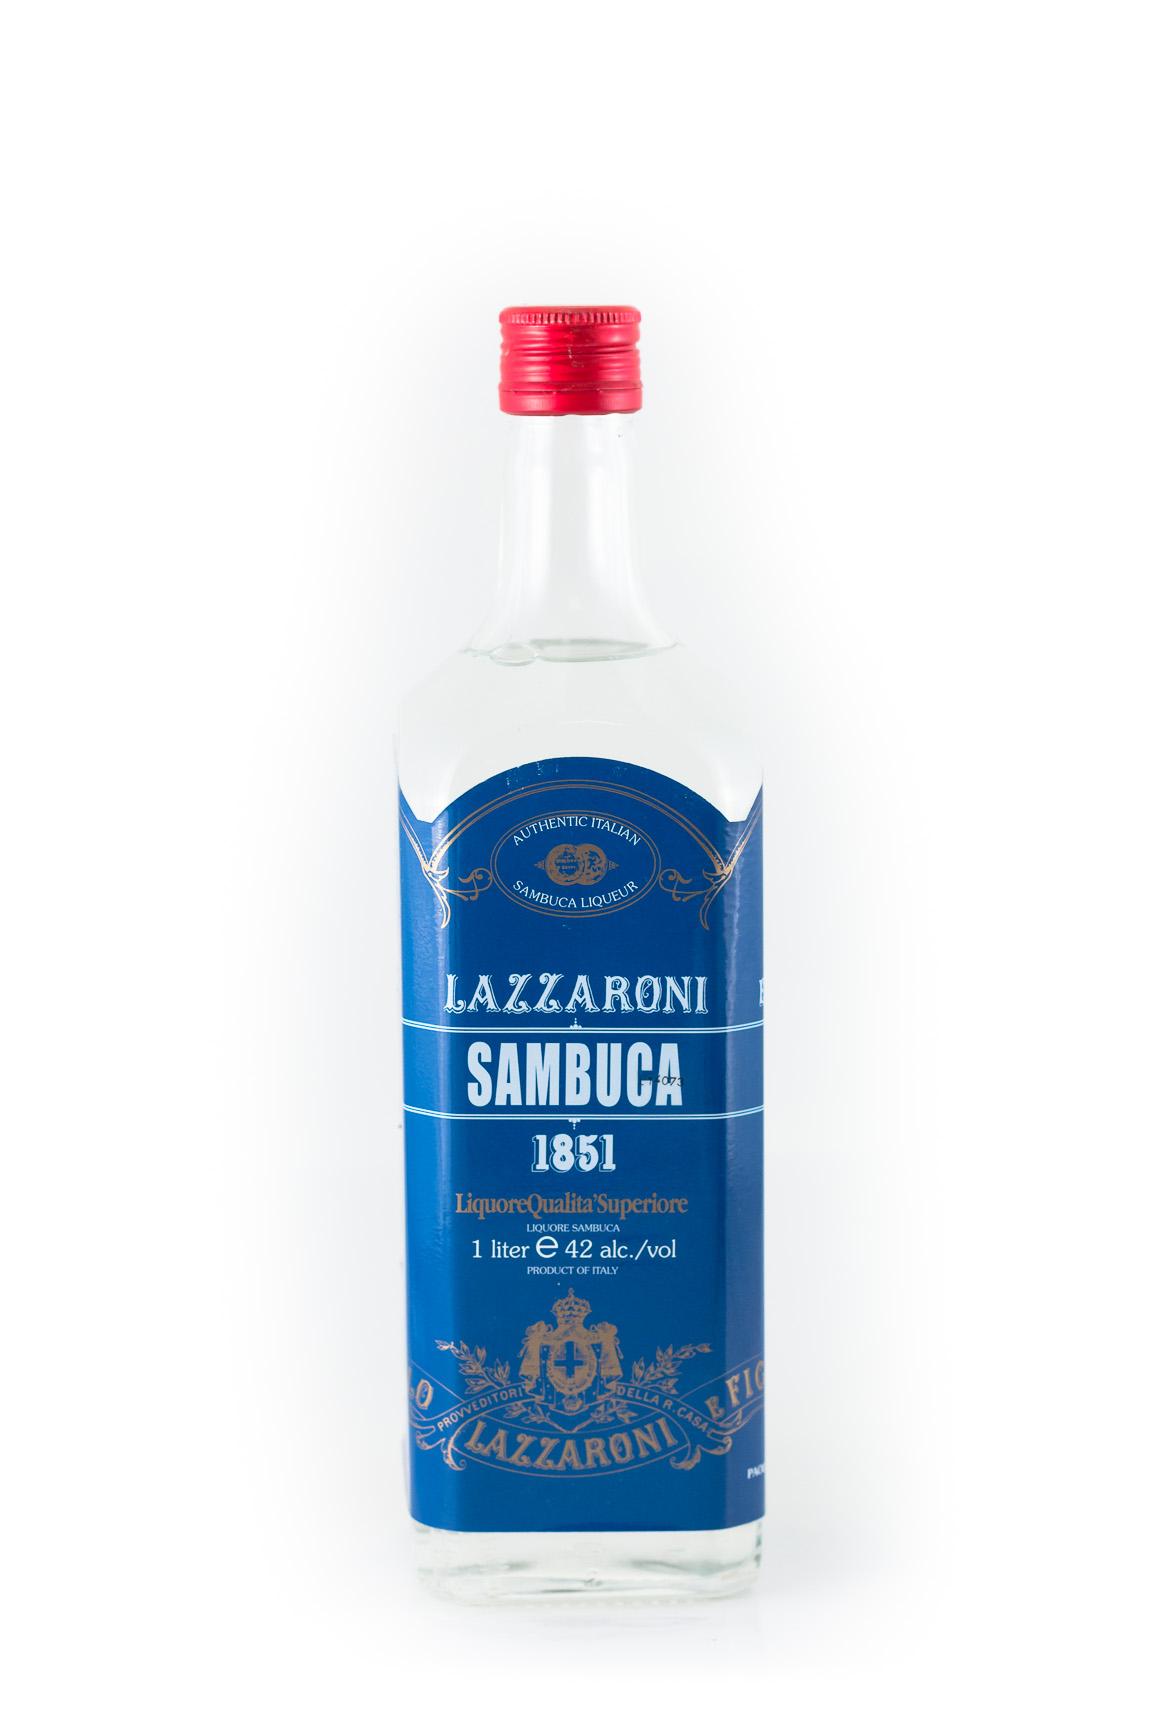 Lazzaroni Sambuca 1 Liter kaufen ab 18,45 EUR im Sambuca Shop ...